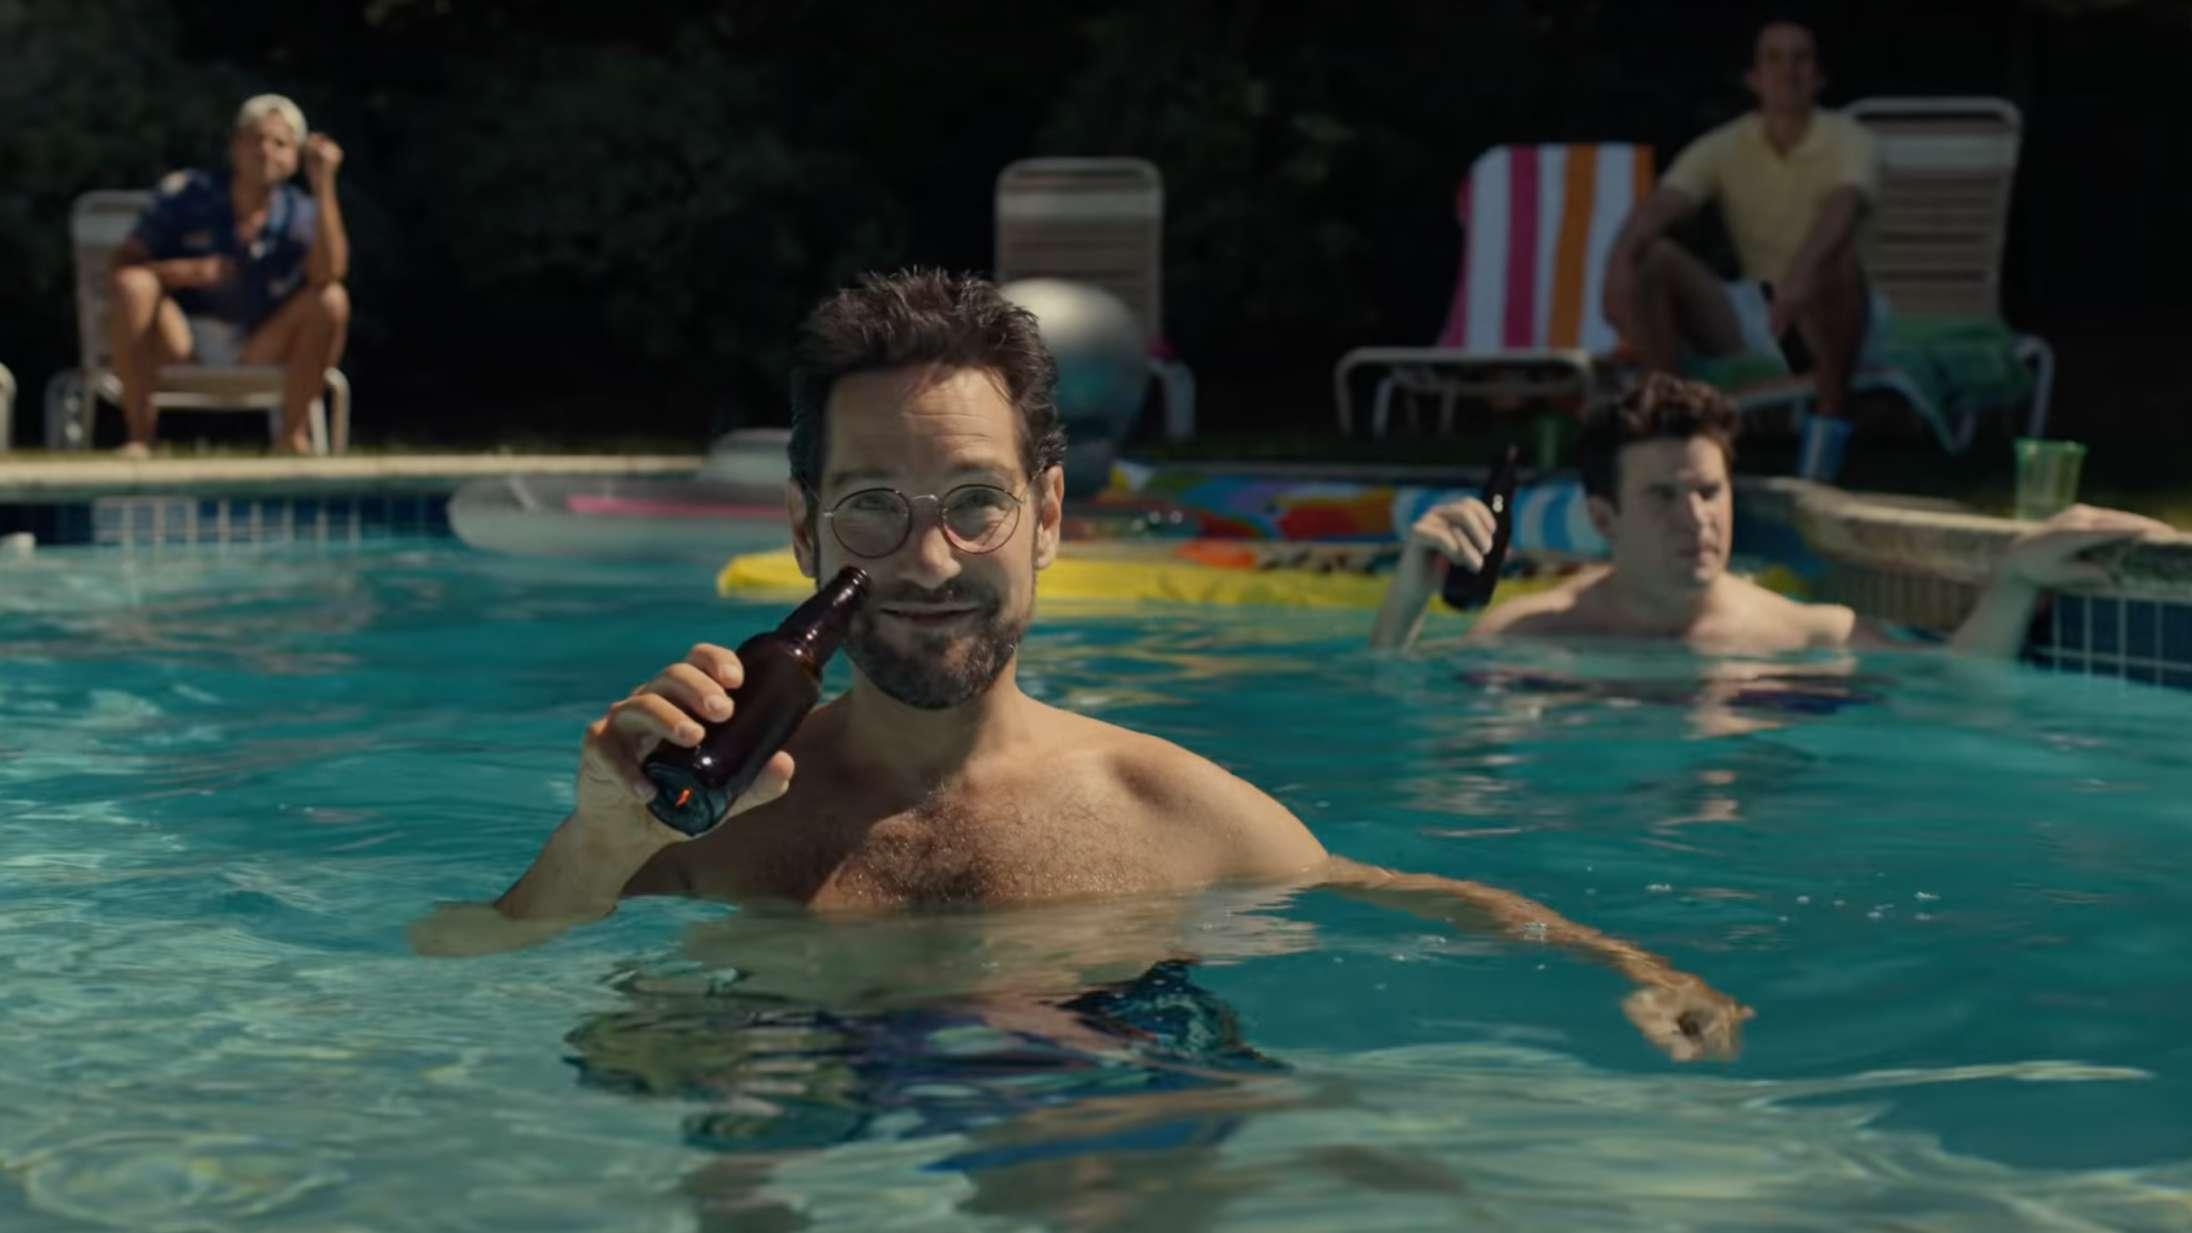 Paul Rudd overtager Will Ferrells liv i serien 'The Shrink Next Door' – se den første trailer